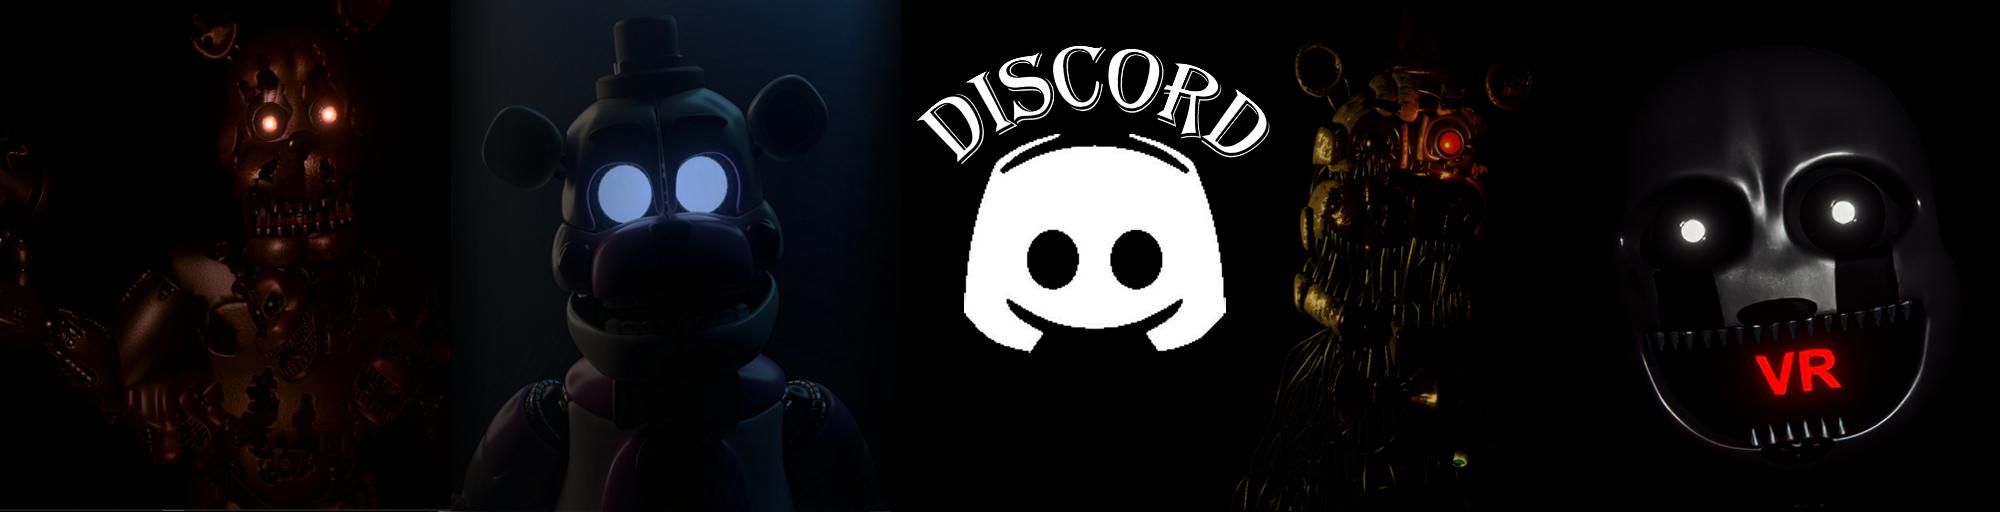 Fnaf VR Fangames Discord Server